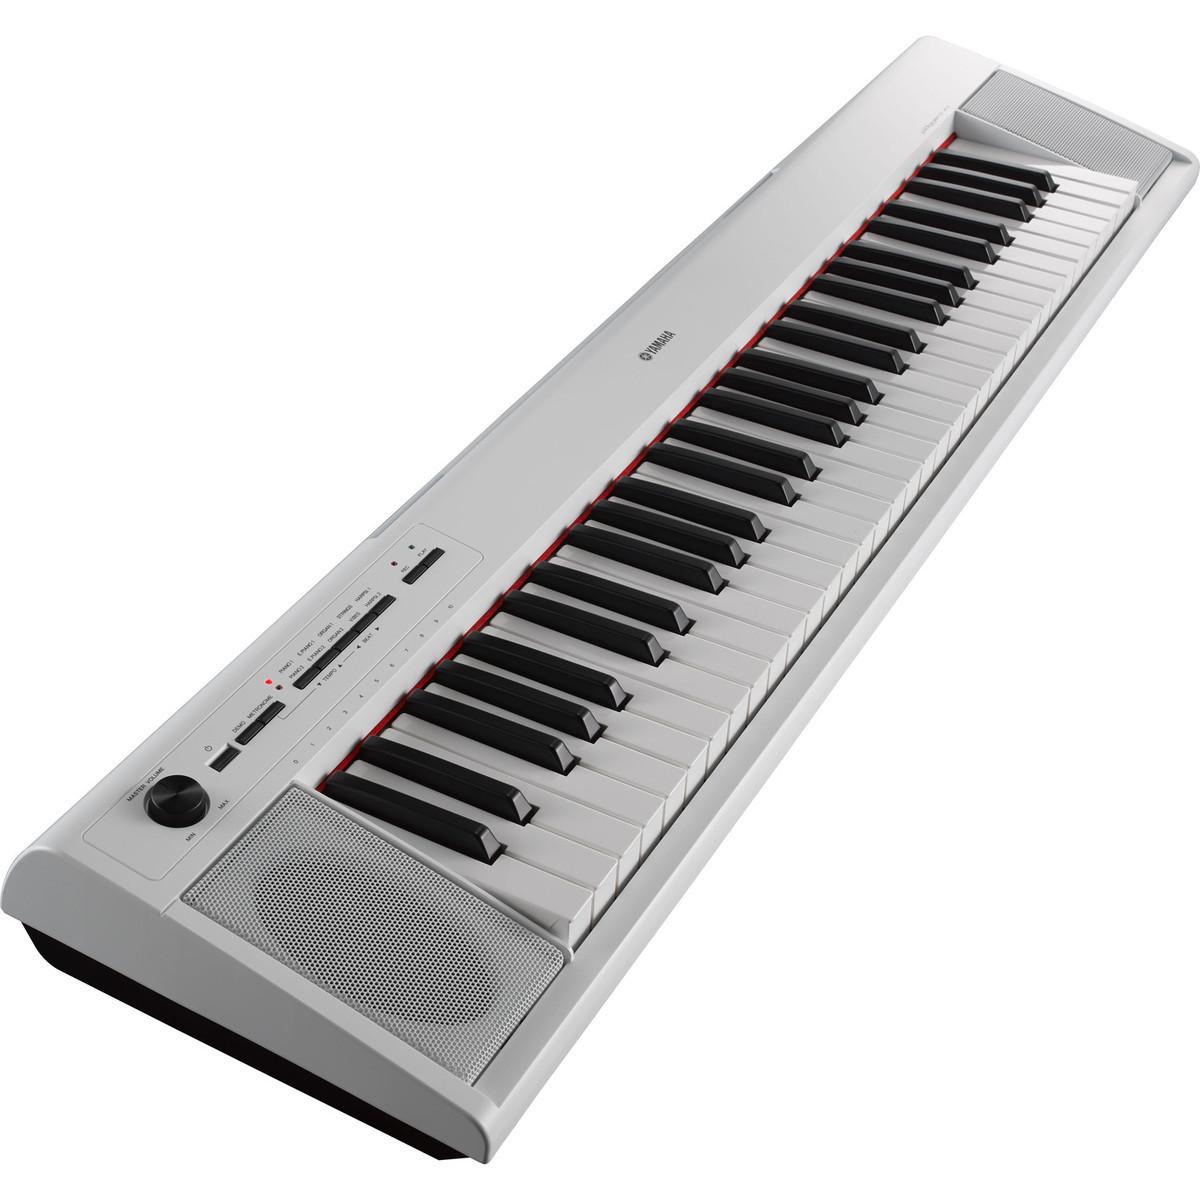 yamaha piaggero np12 portable digital piano white inc accessories at gear4music. Black Bedroom Furniture Sets. Home Design Ideas